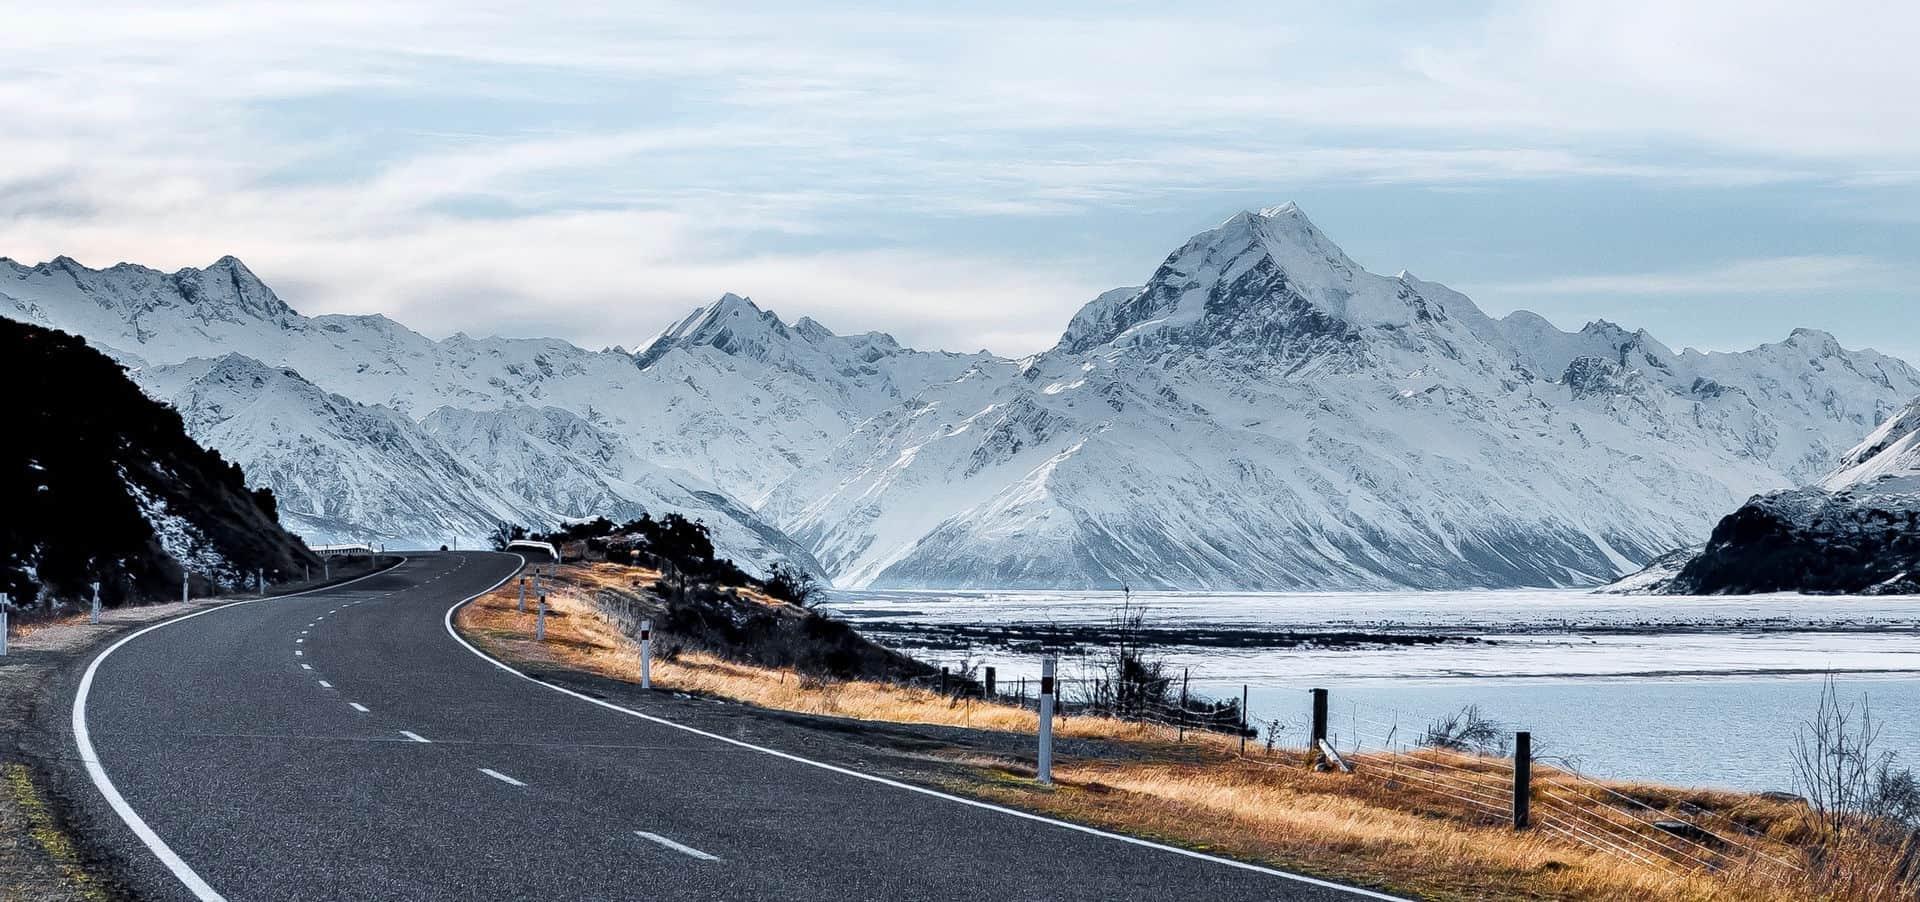 Droga, góry